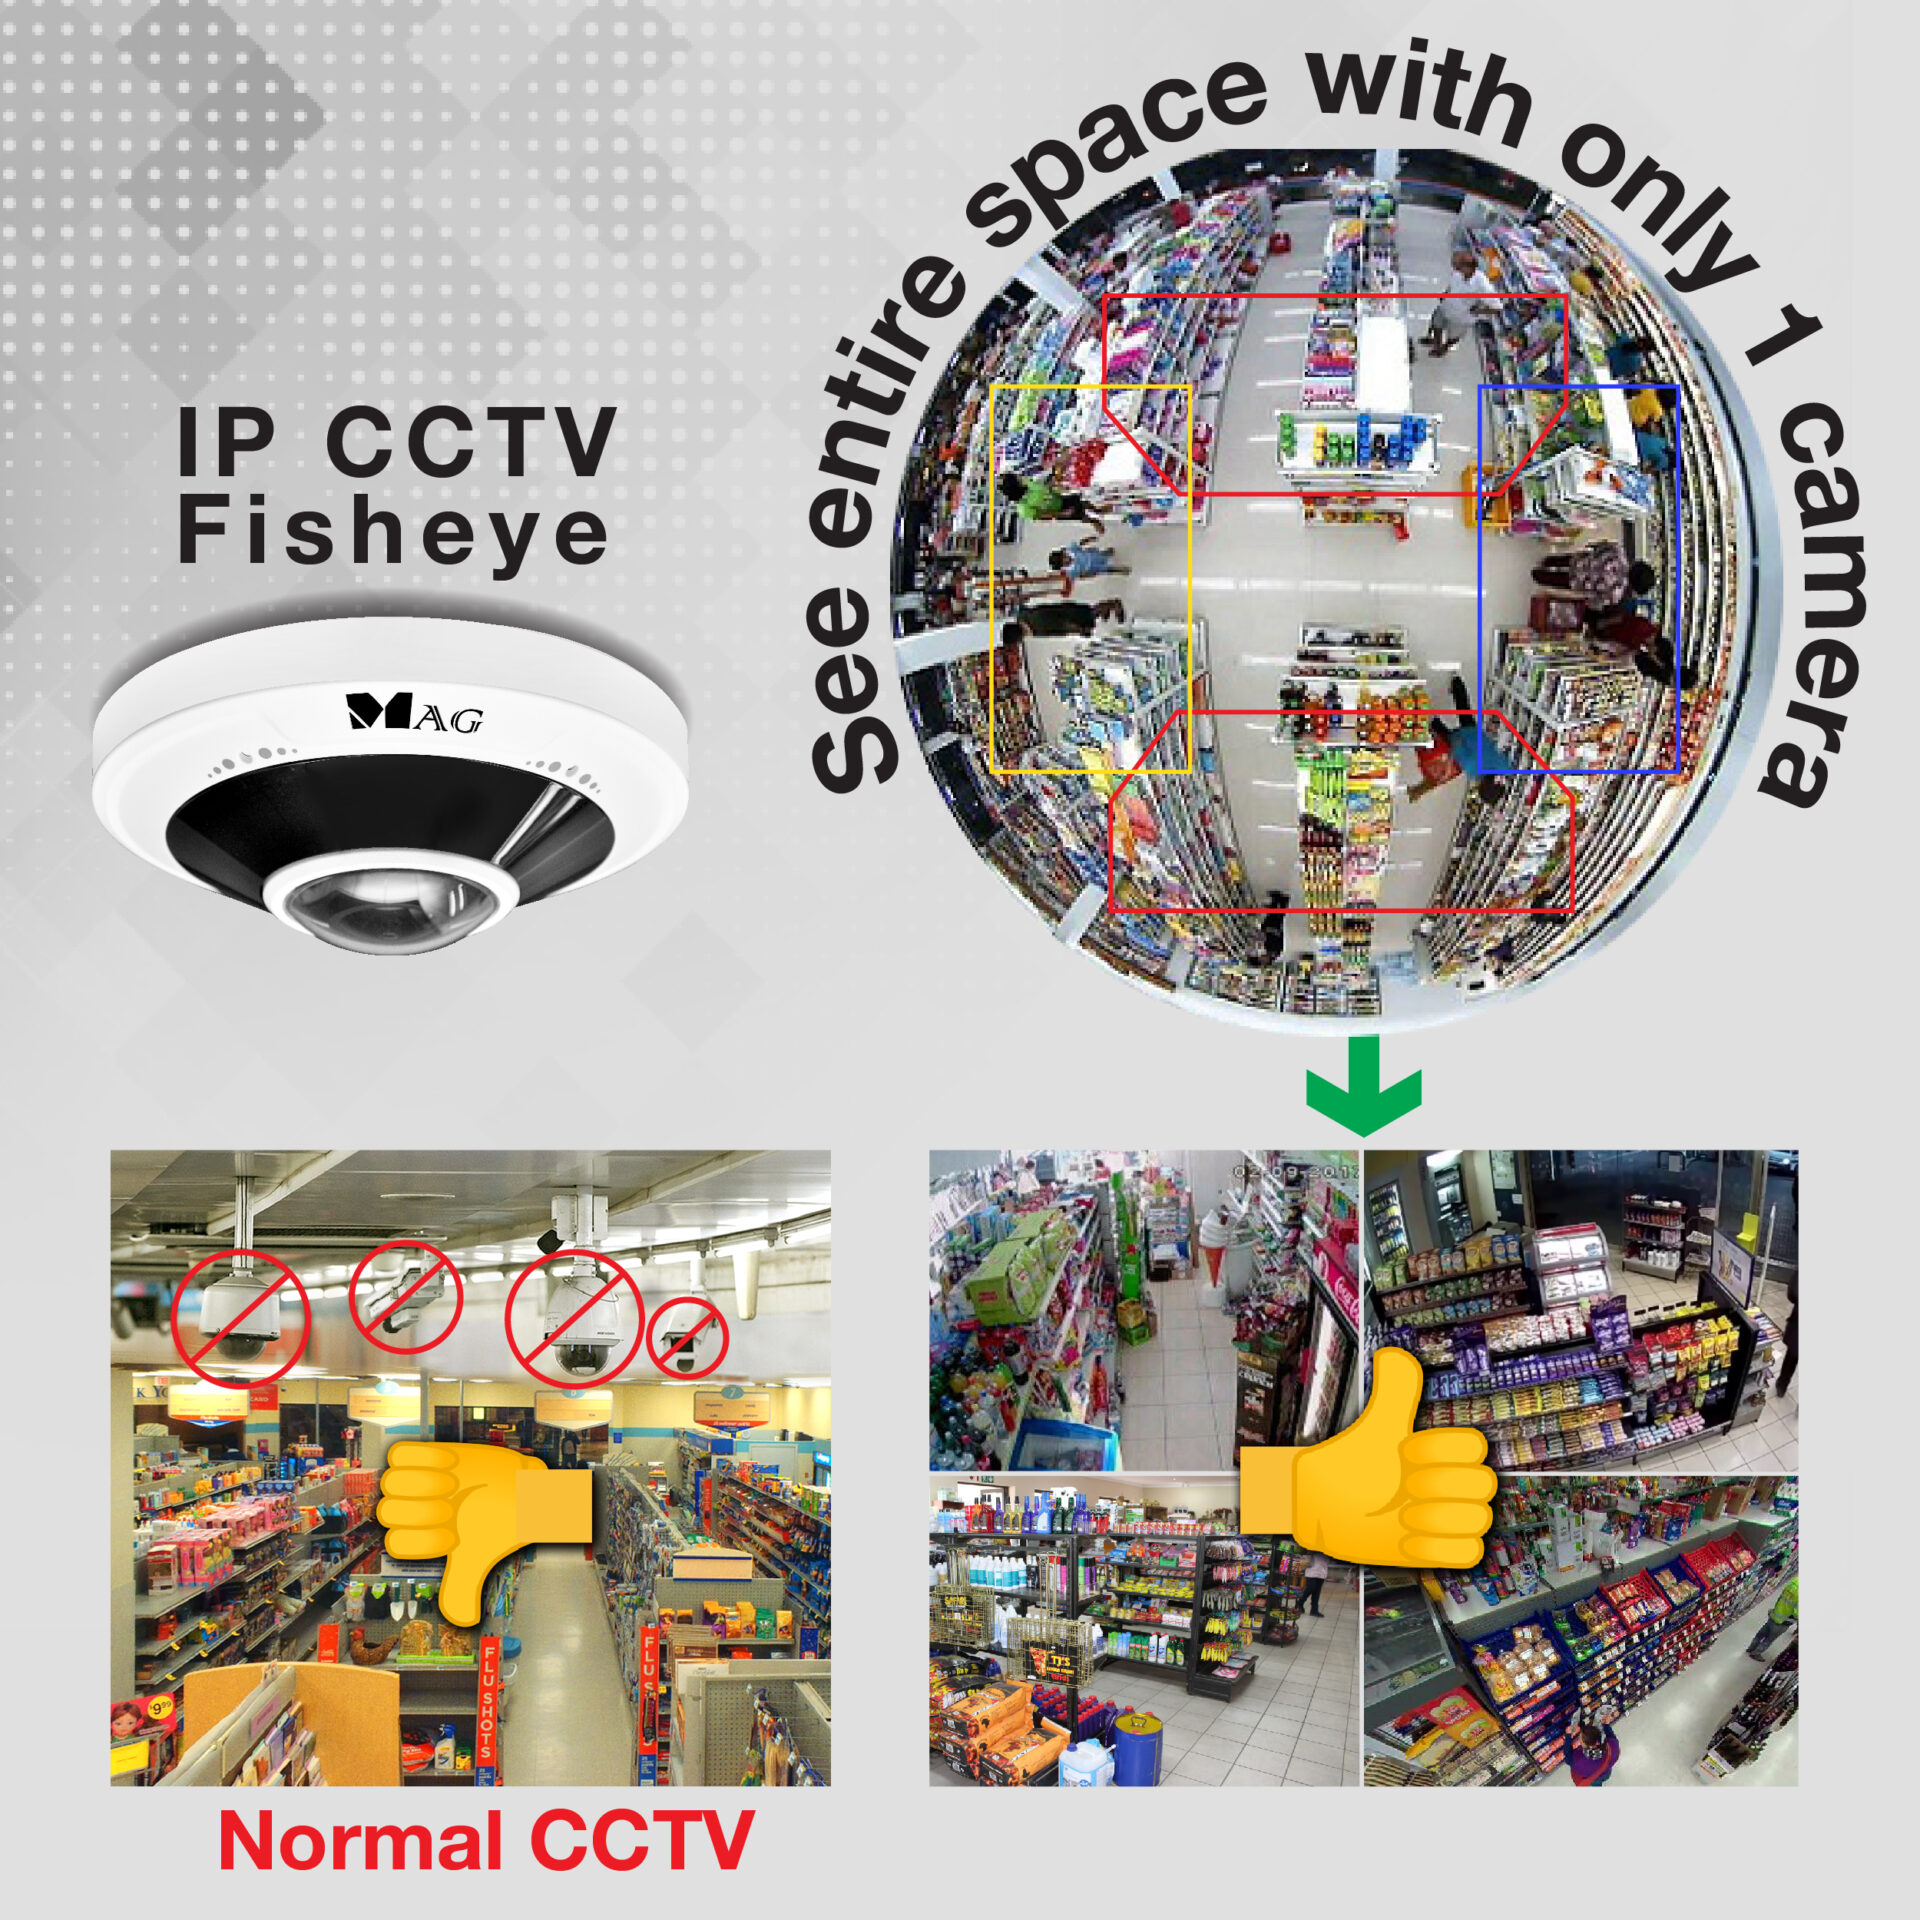 IP CCTV fisheye